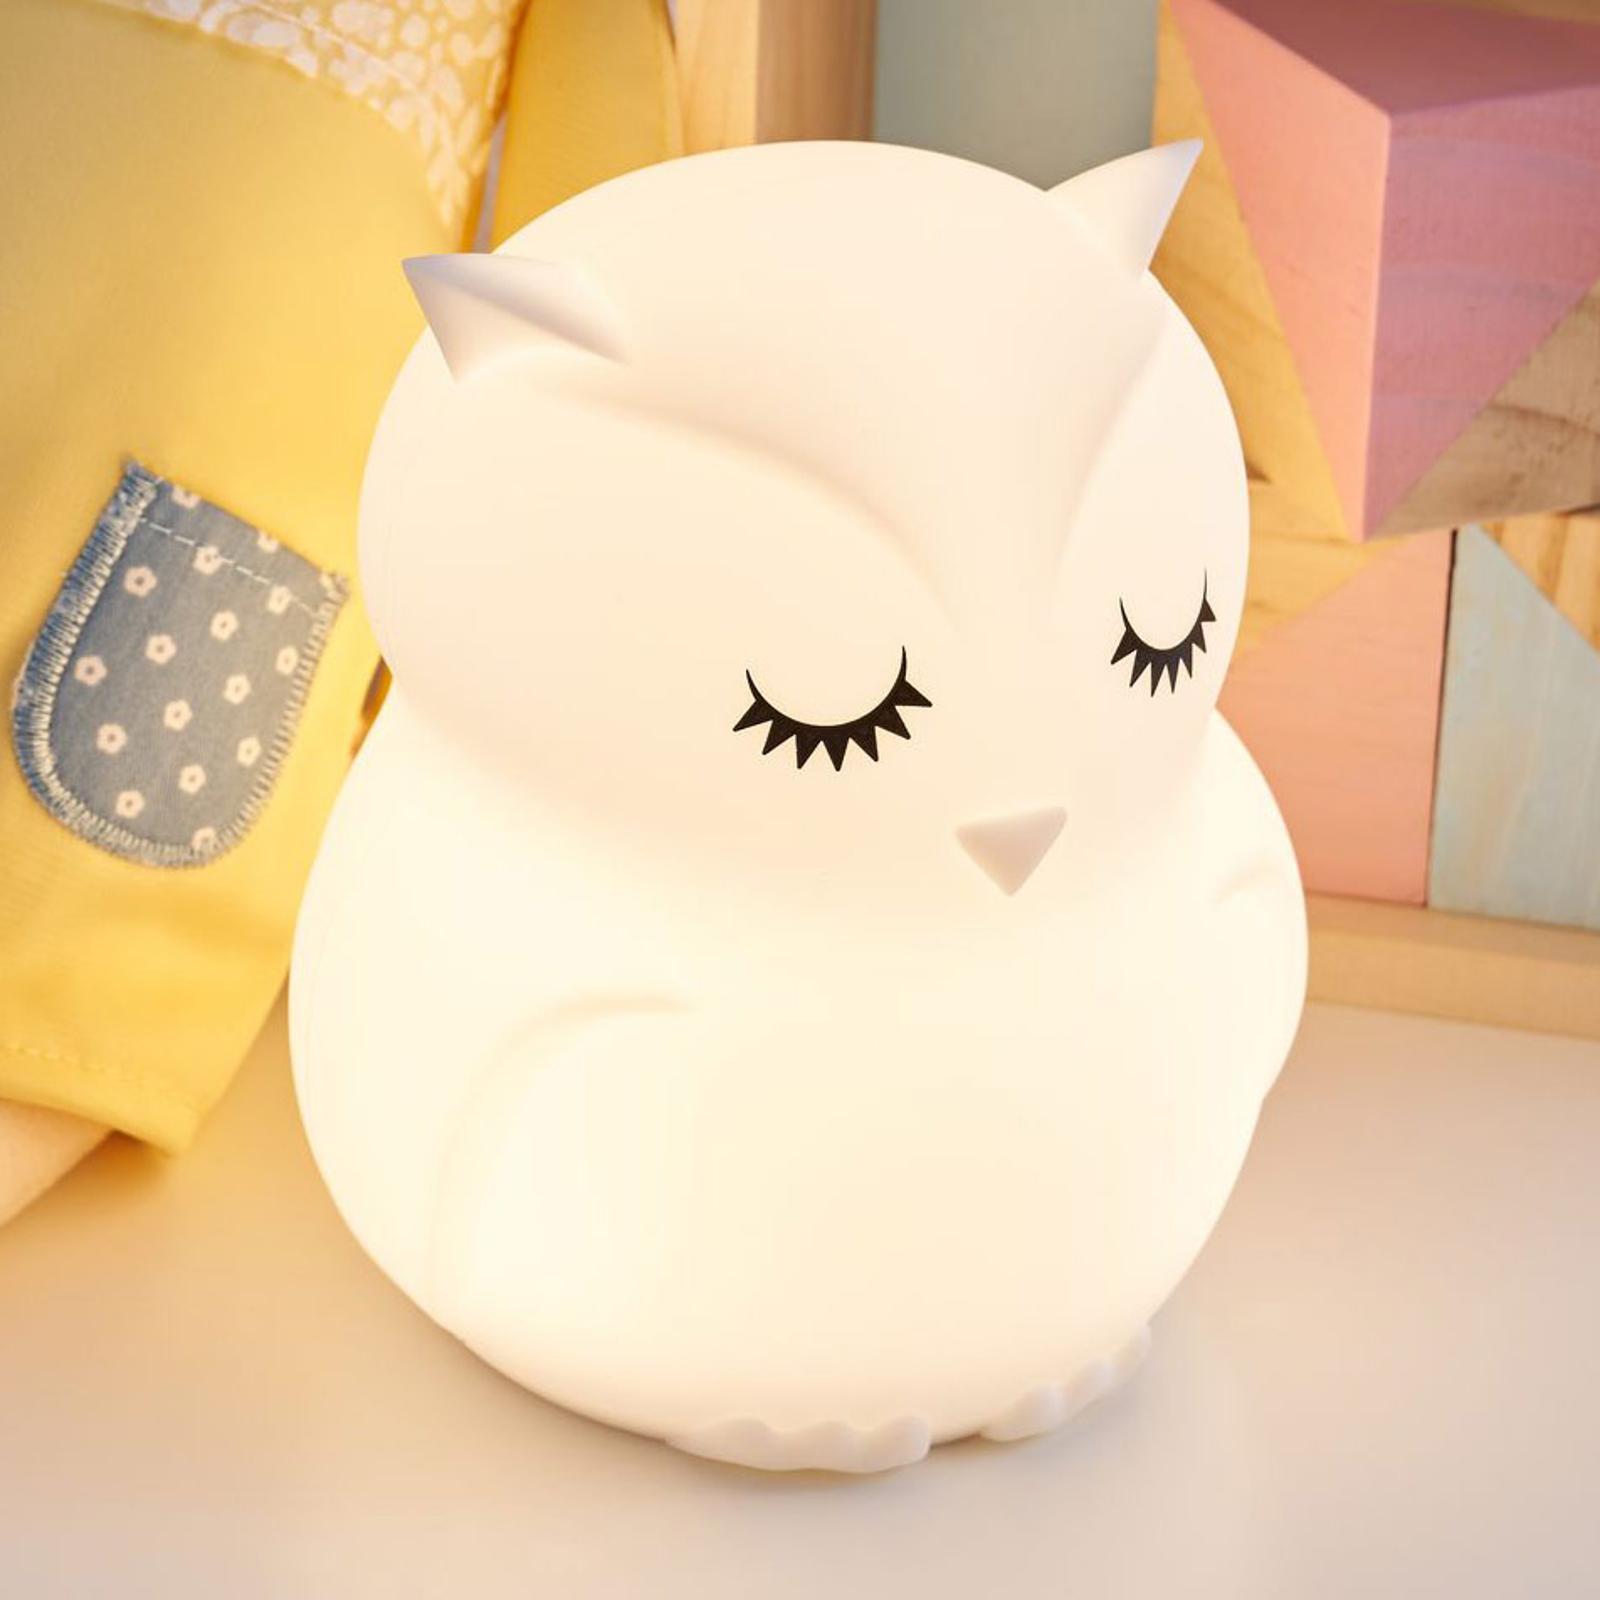 Pauleen Good Night Owl LED-Nachtlicht, Farbwechsel